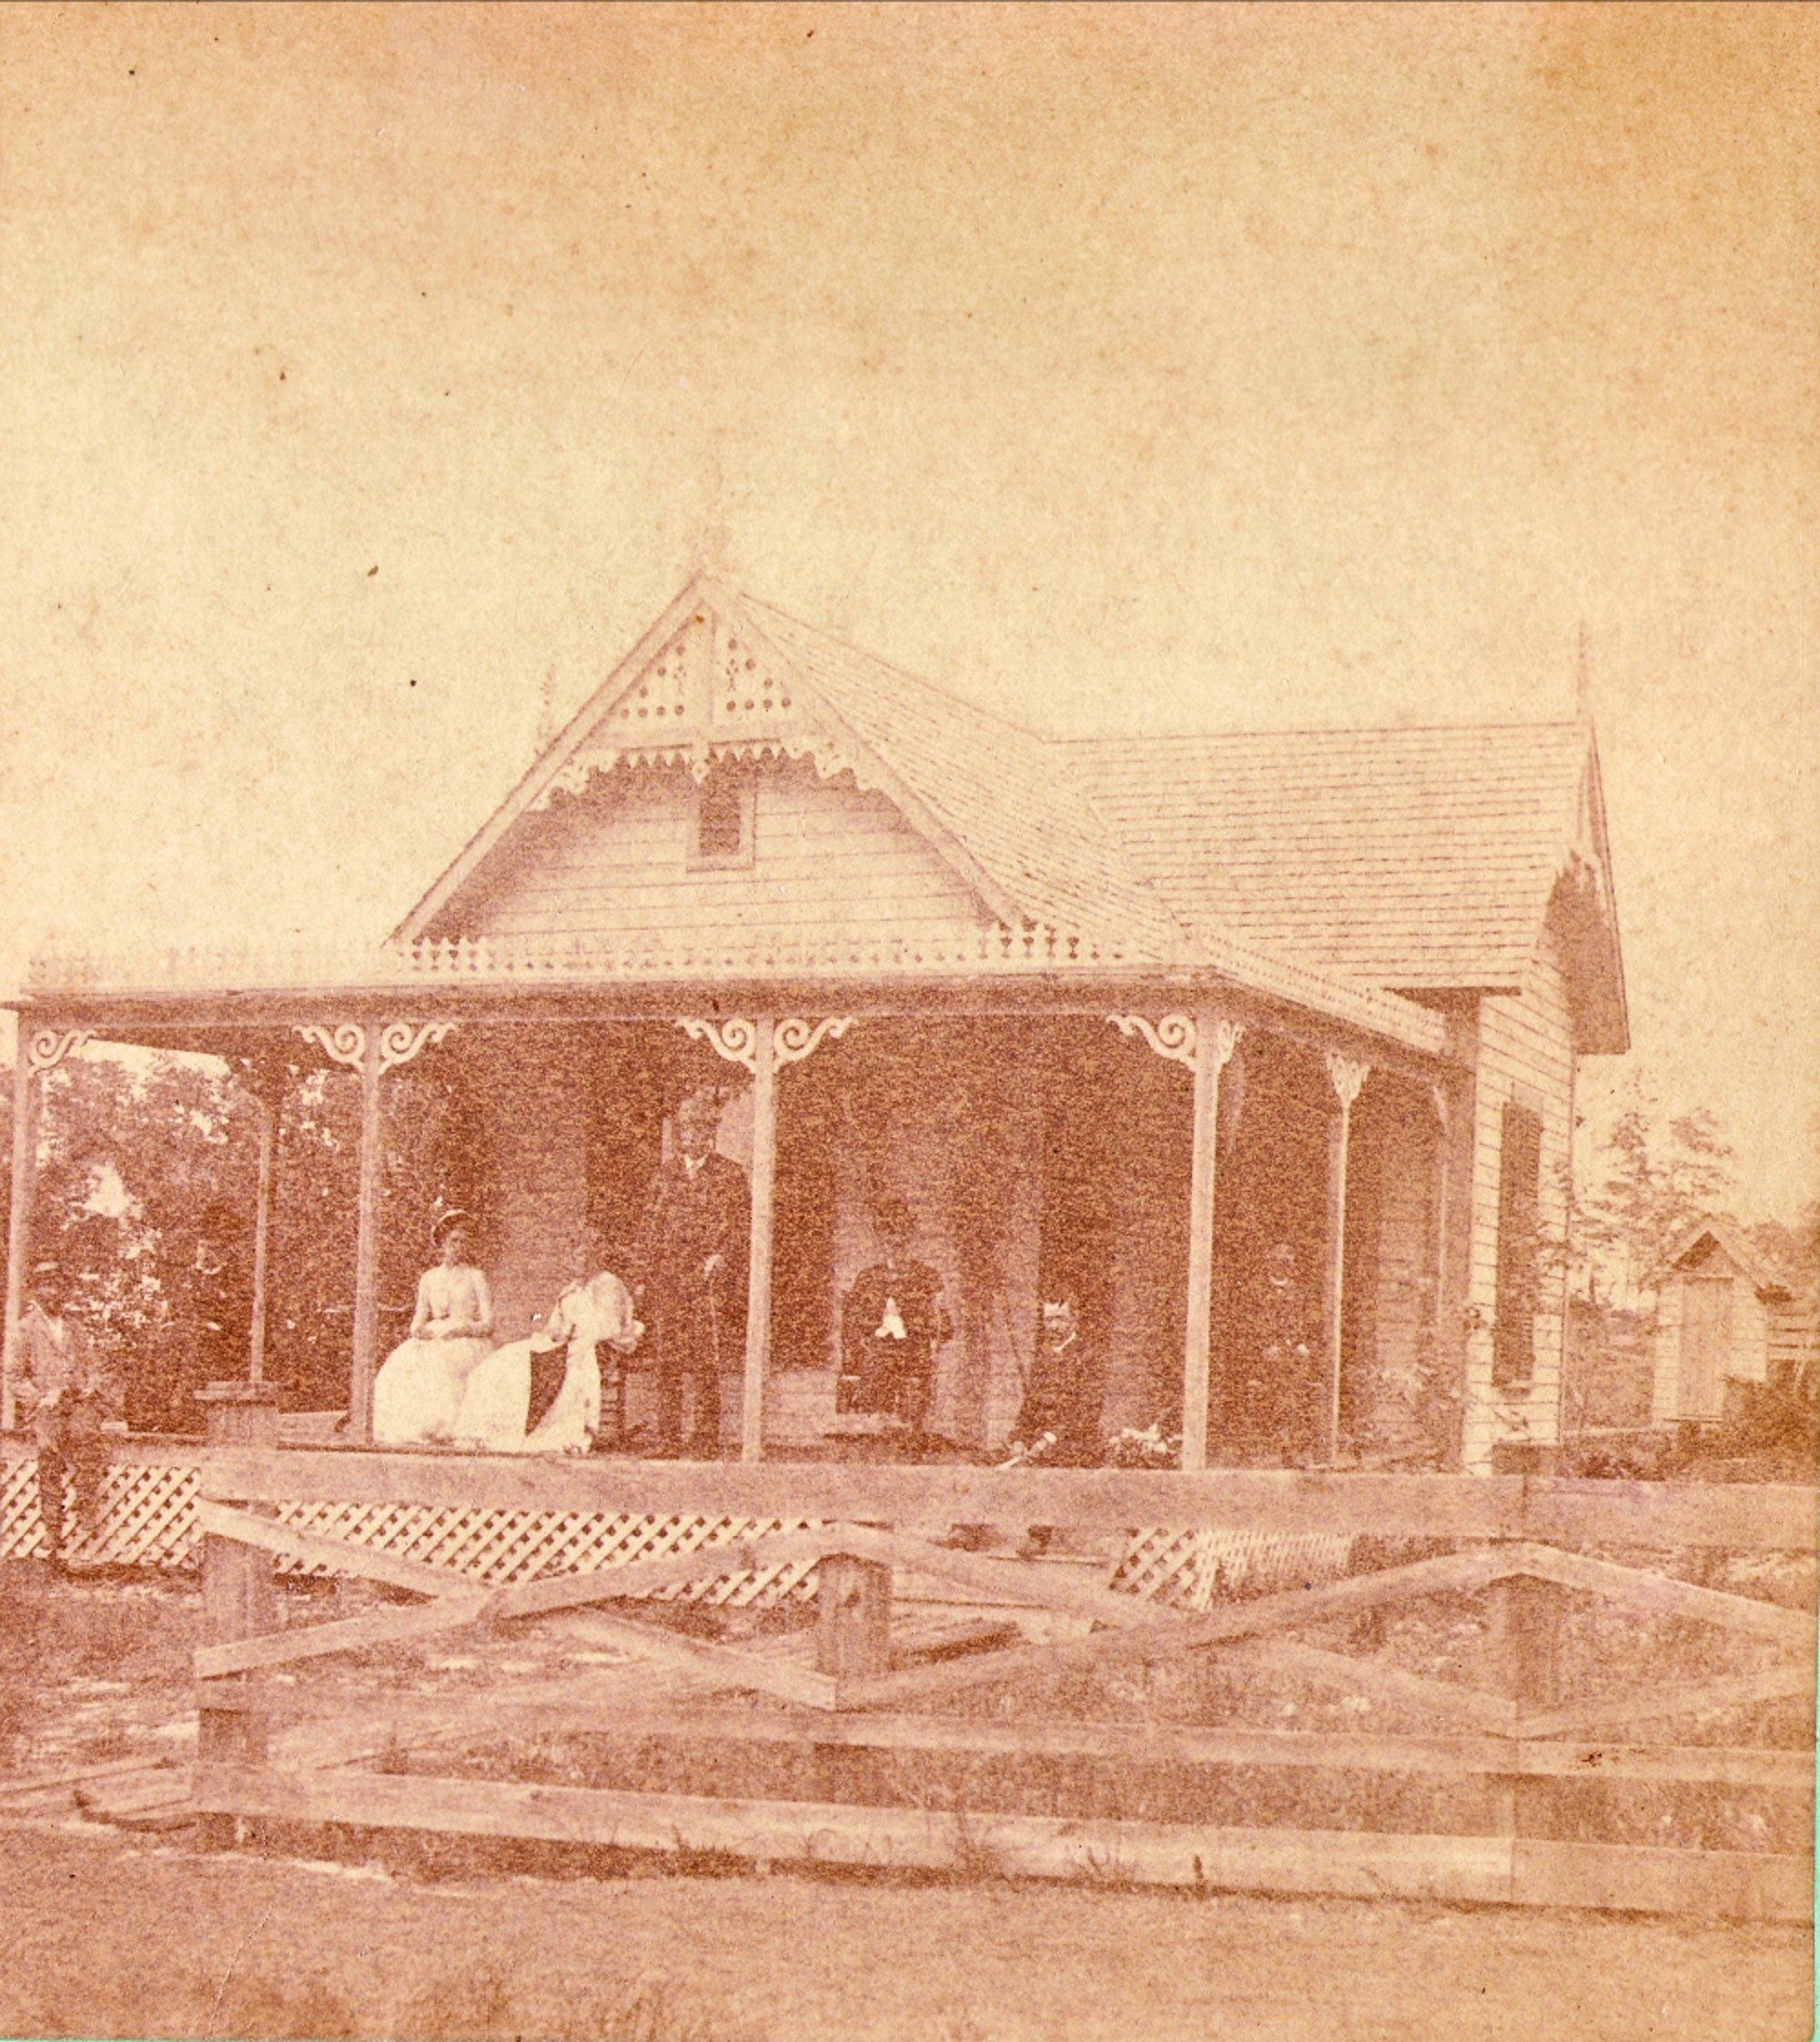 John and Miranda Graham Home at 246 North Oak Avenue. Photographed by Moses M. & Wm. H. Gardner. (c.1894) Photograph courtesy of City of Orange City, FL.